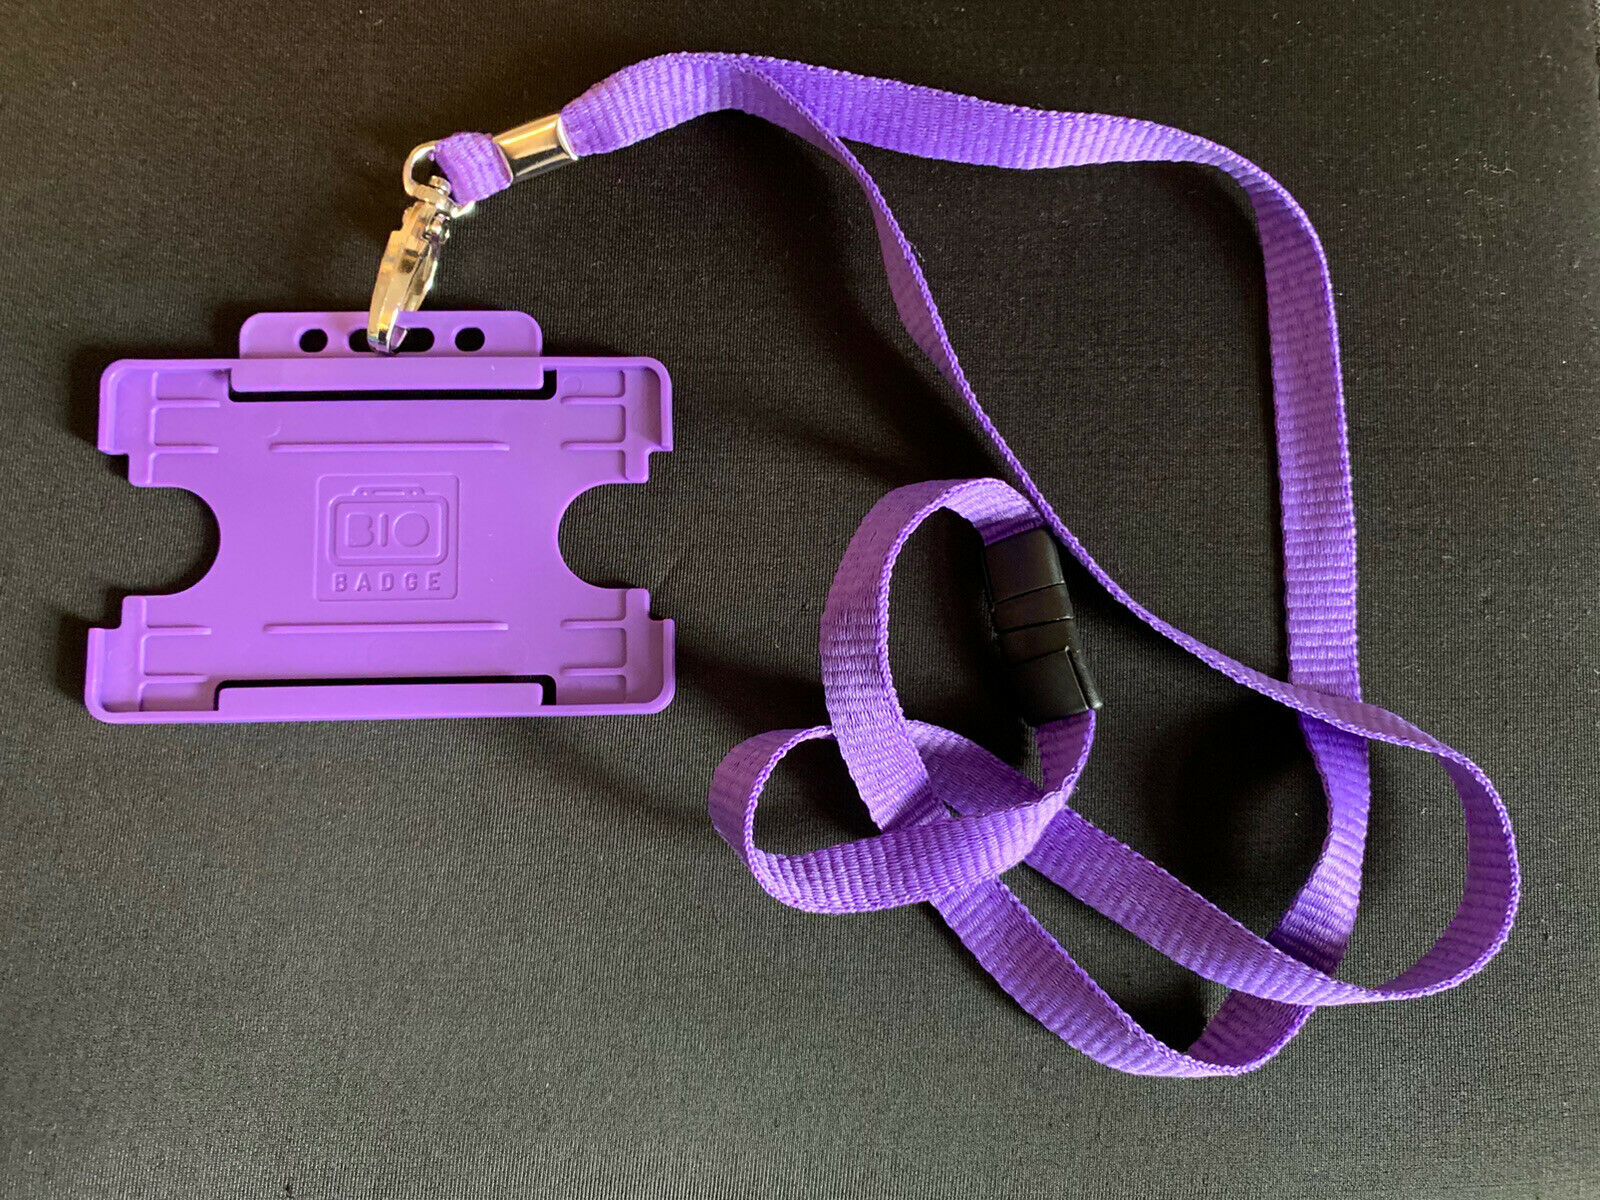 1 x Purple ID Card Holder With Purple Lanyard